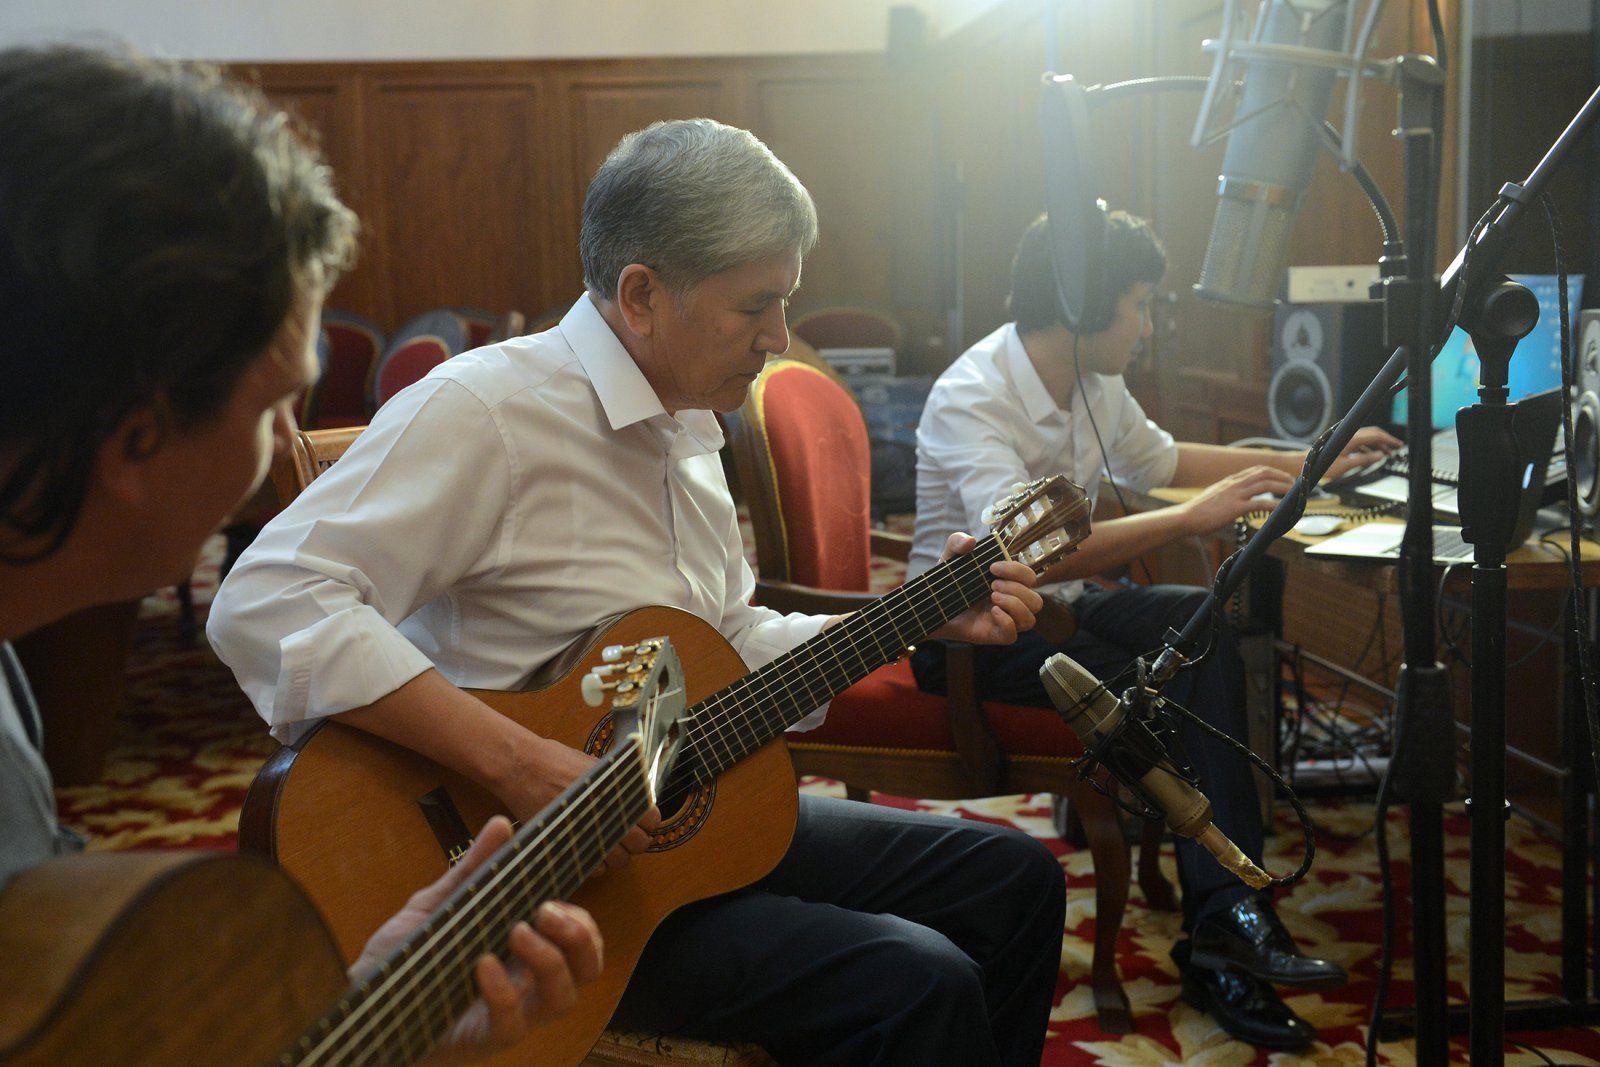 Atambajew im Aufnahmestudio Musik Gitarre